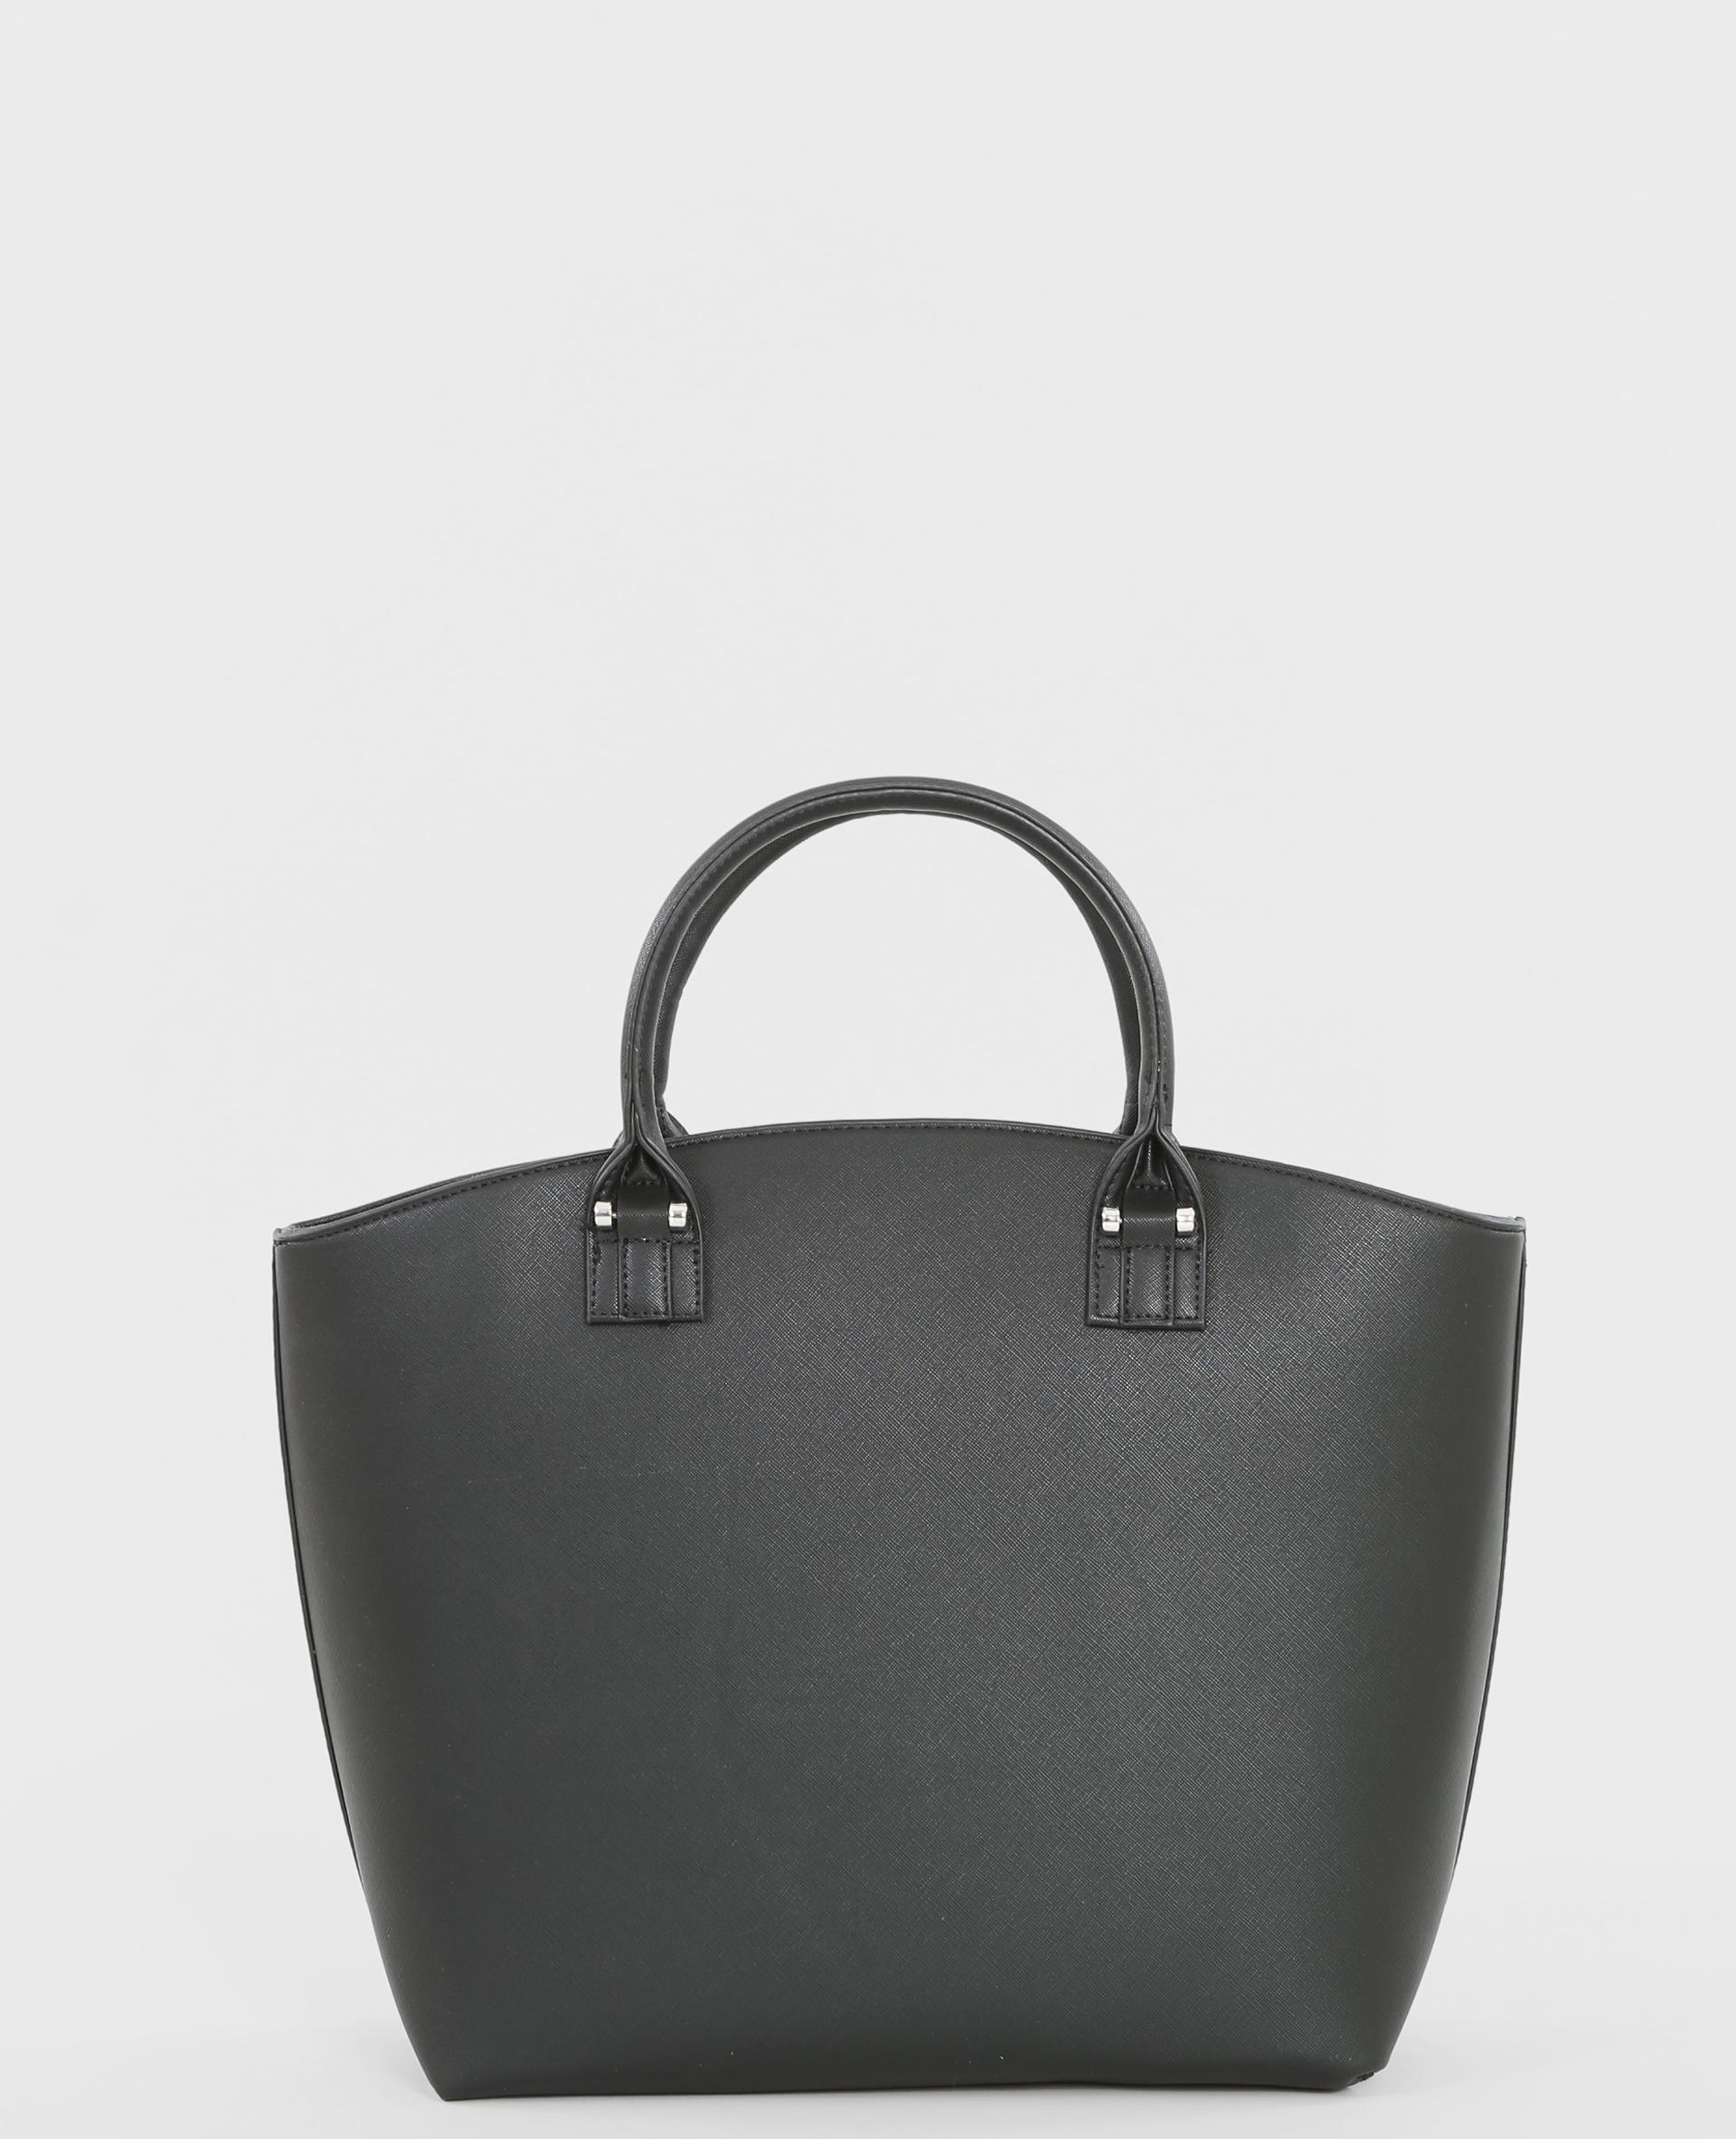 grand sac rigide noir 983075899a08 pimkie. Black Bedroom Furniture Sets. Home Design Ideas